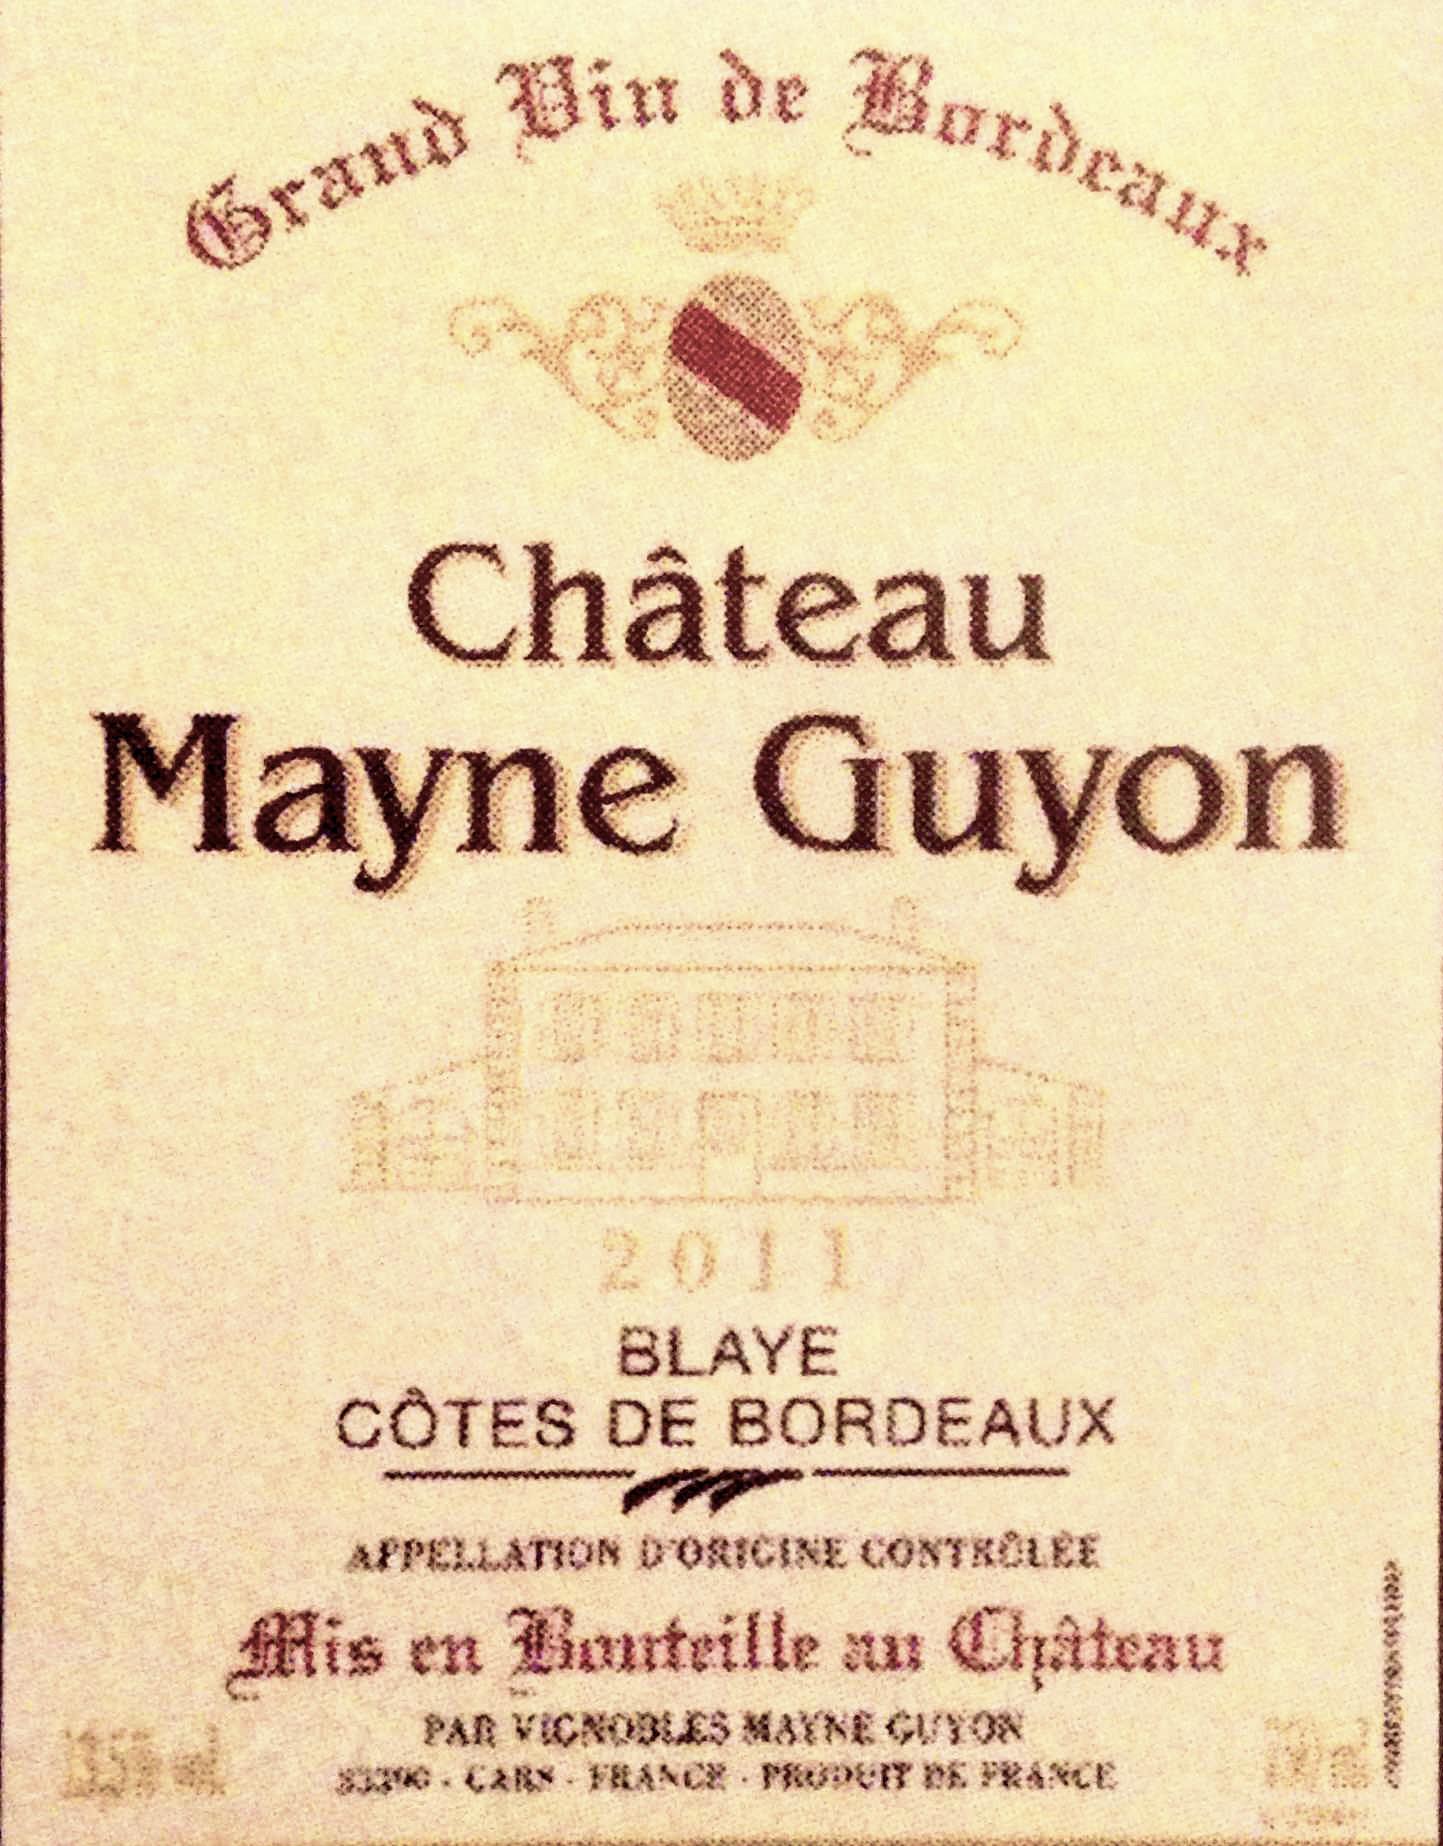 Chateau Mayne Guyon 2011, 1.jpg